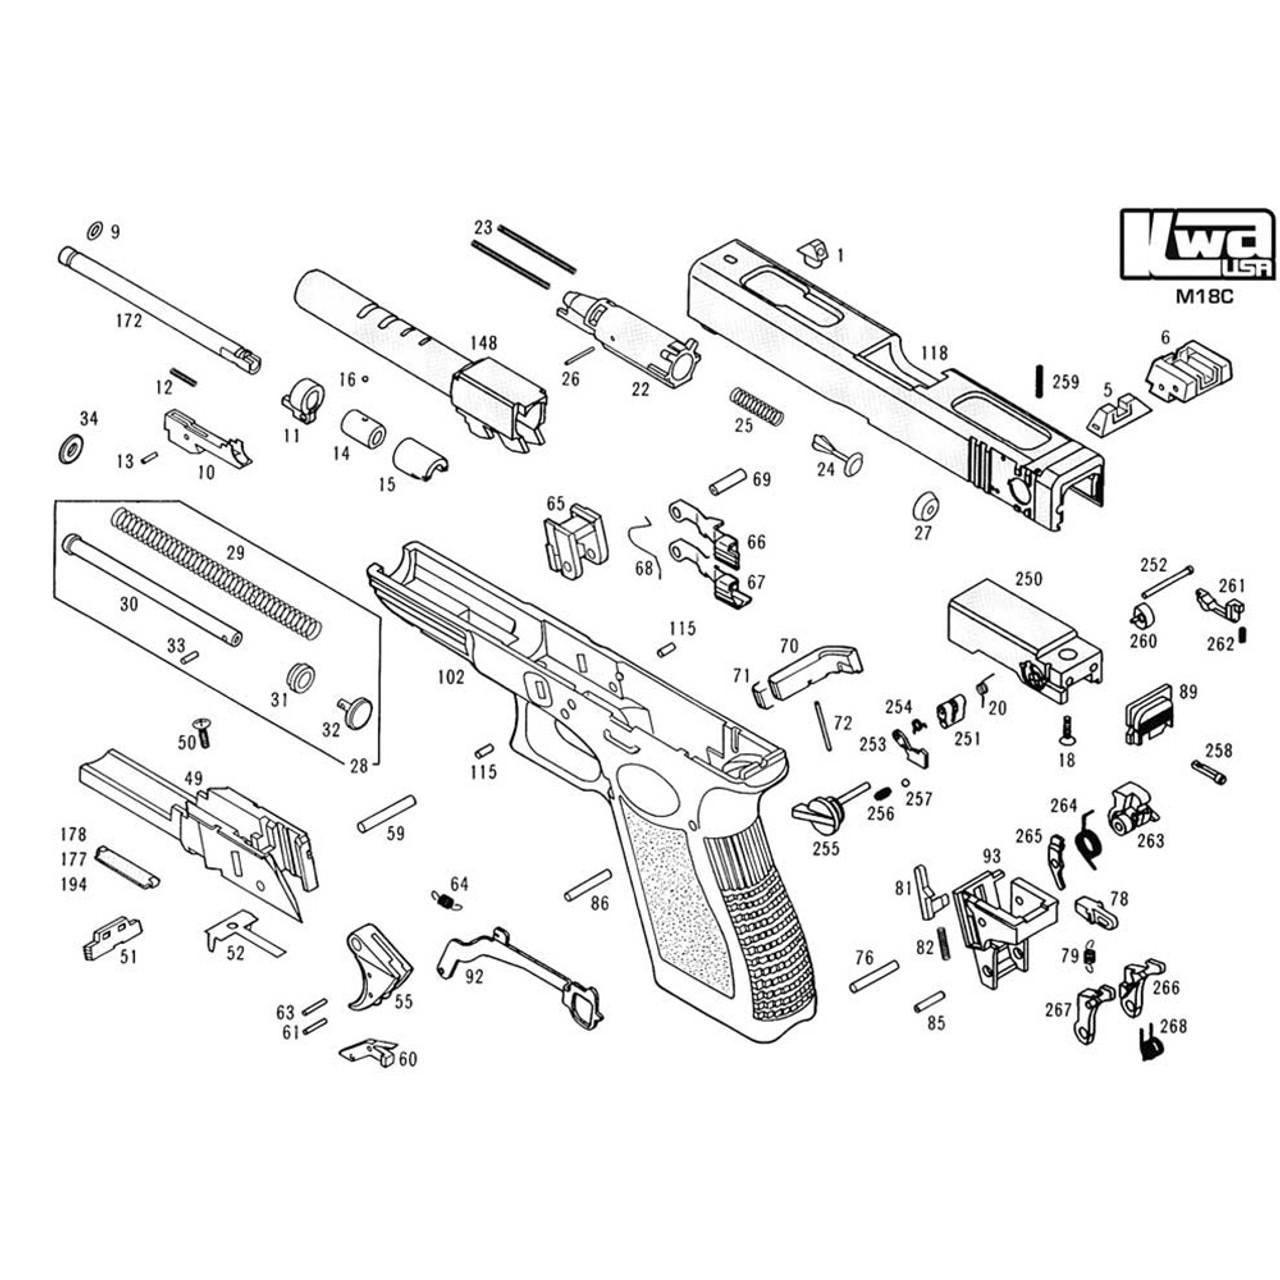 medium resolution of kwa airsoft m18c pistol diagram